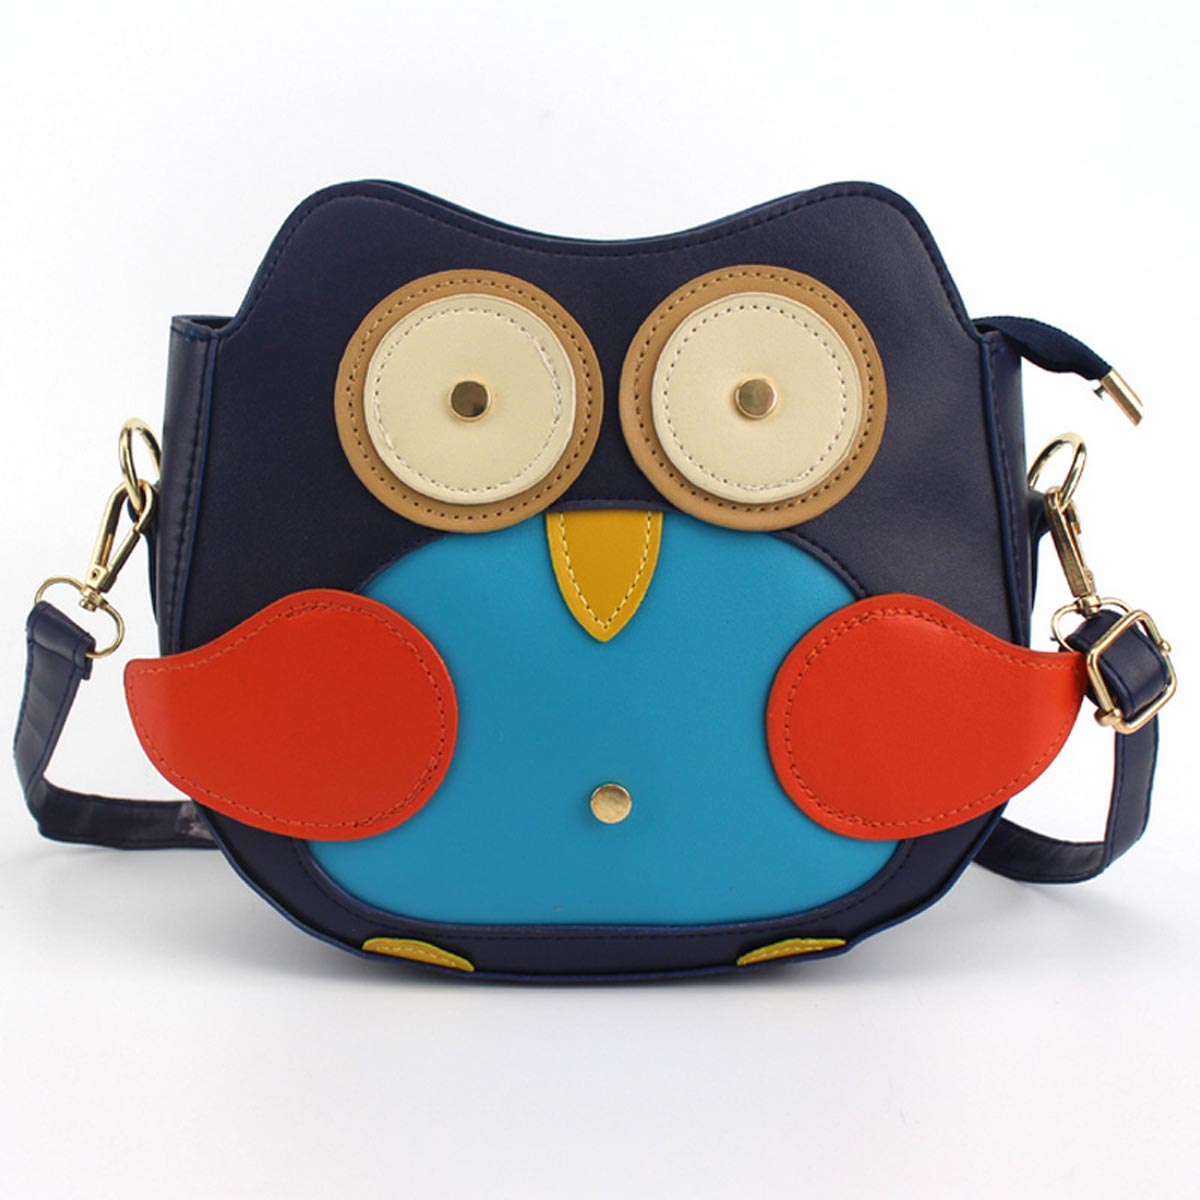 New Women Girls Cartoon Owl Crossbody Bag PU Leather Cute Mini Shoulder Bags Messenger Bag Popular